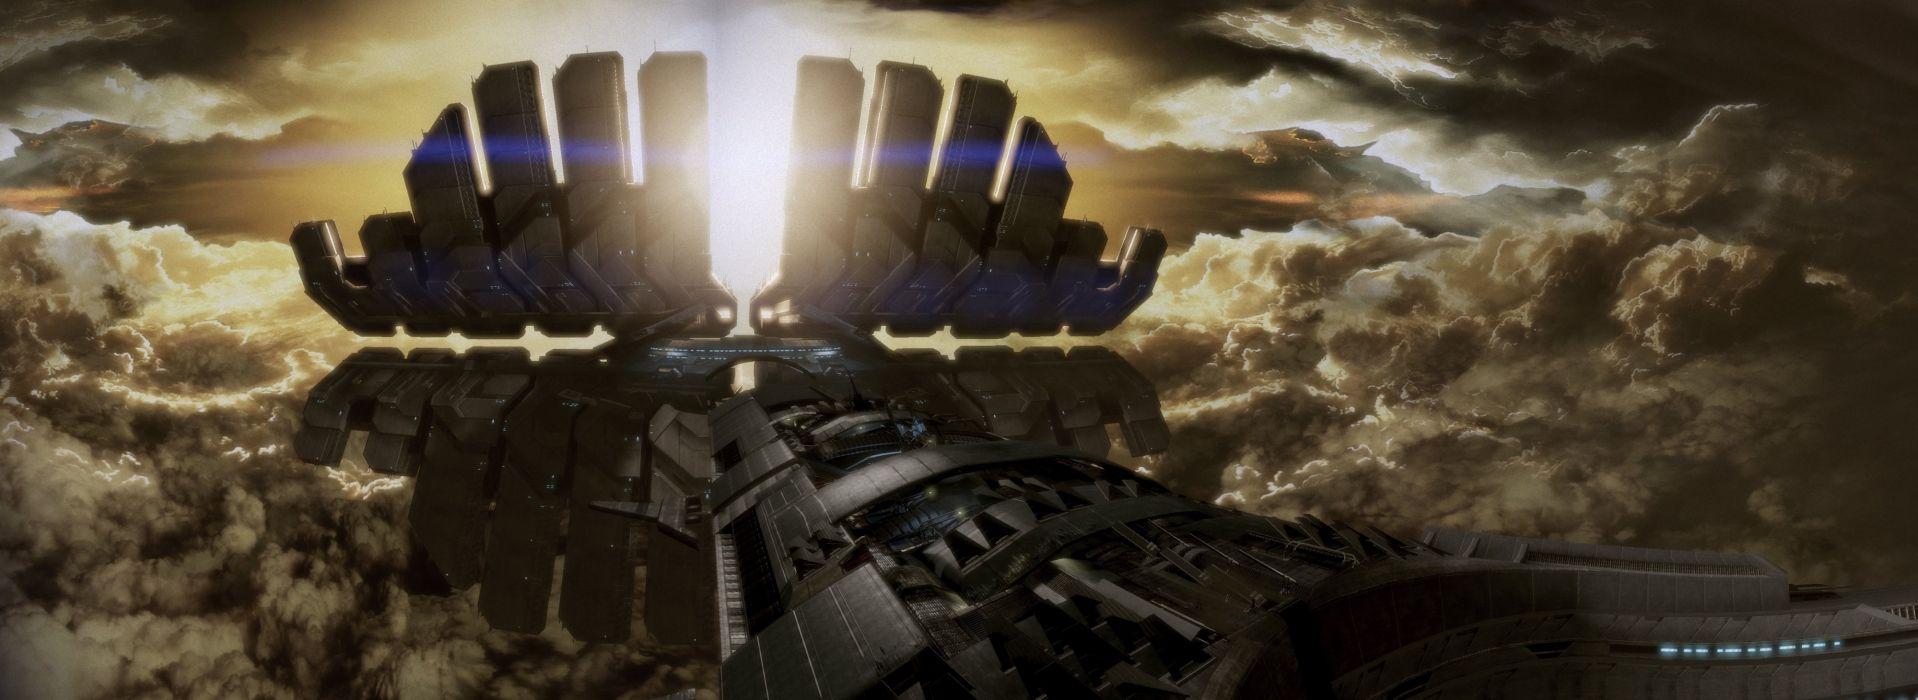 mass effect ship spaceship sci-fi wallpaper